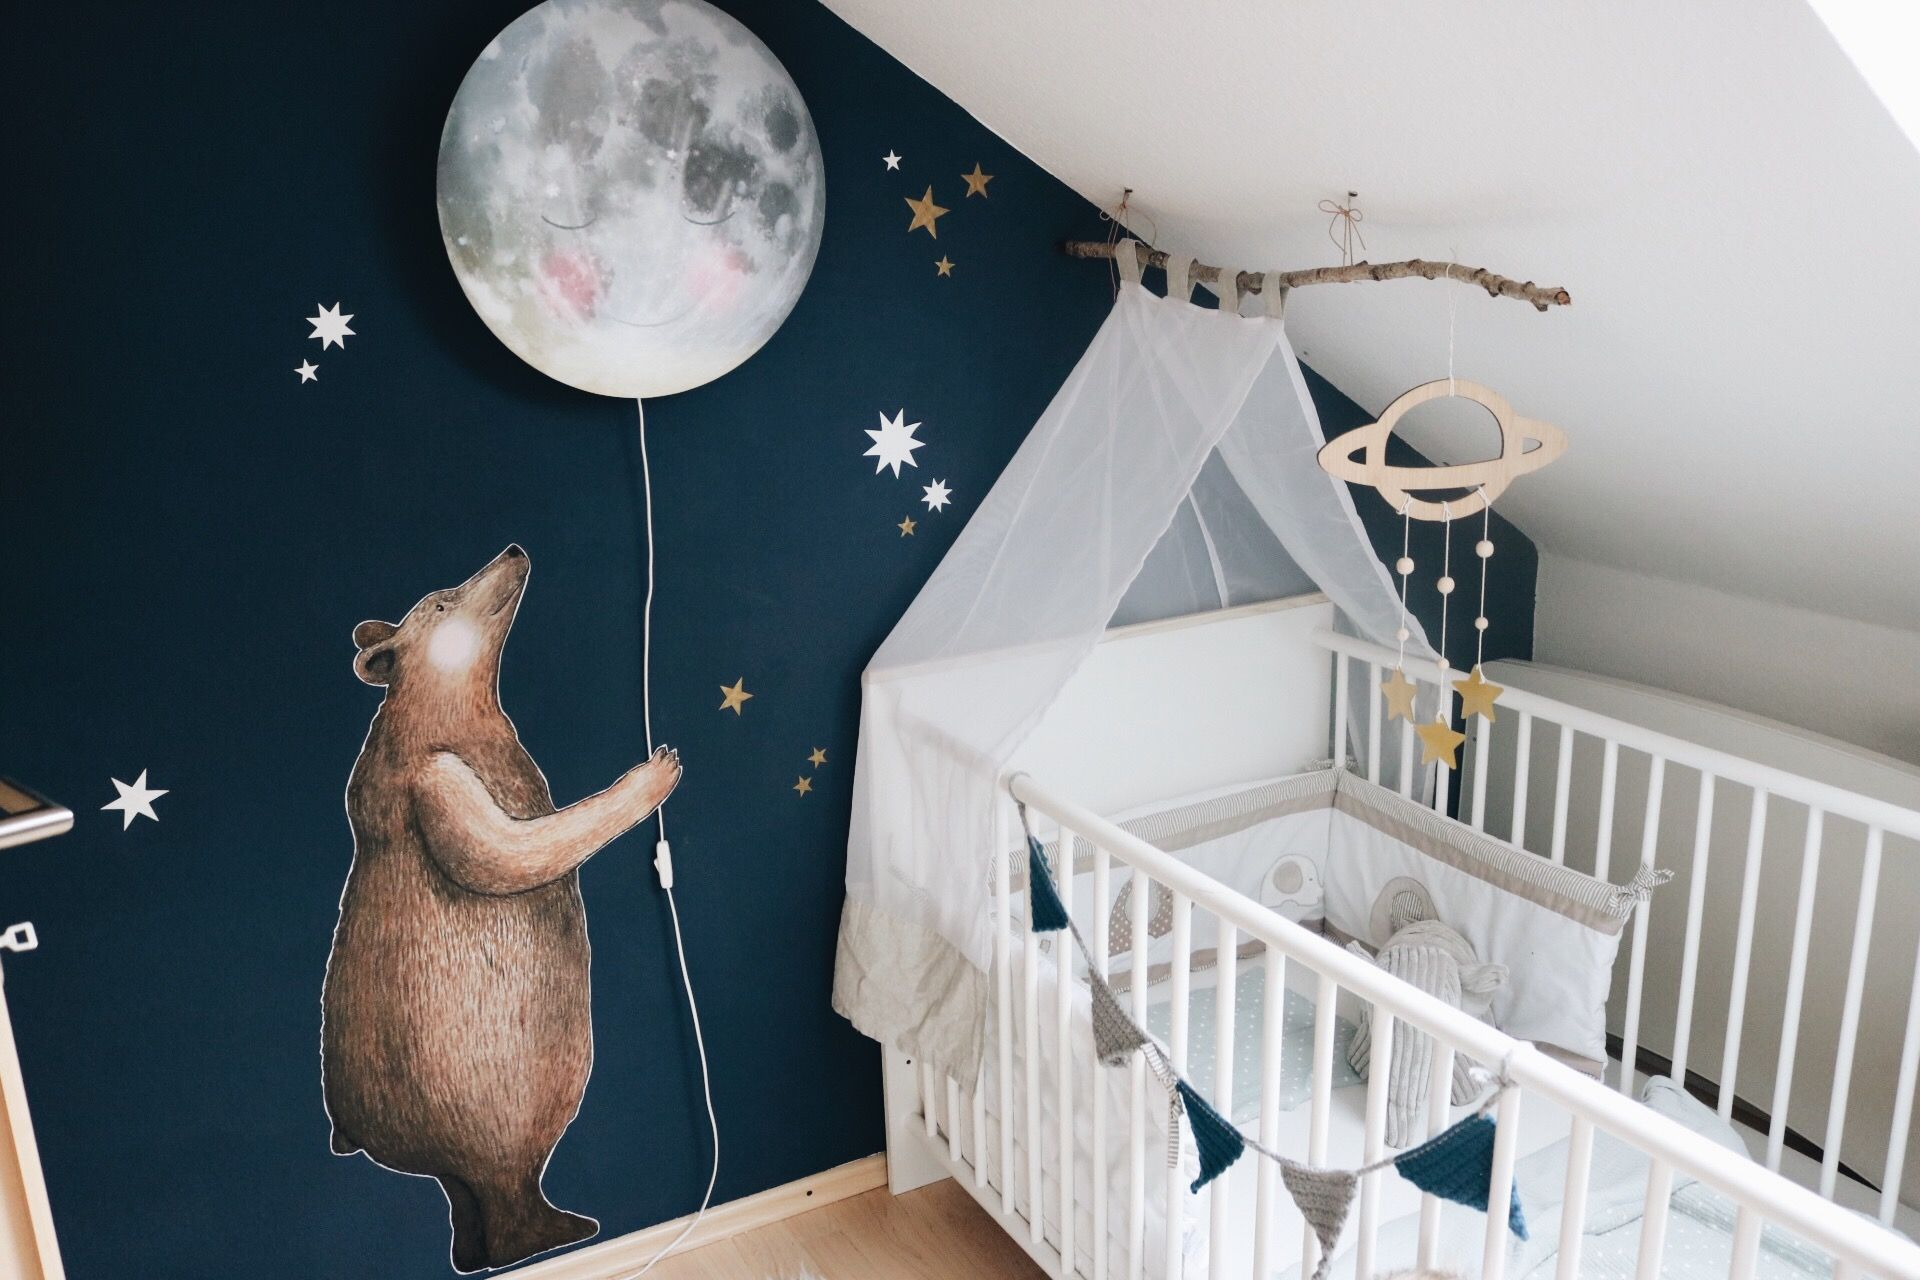 Fabelhaft Babyzimmer Wandtattoo Ideen Von Kinderzimmer Hartendief Bär Mond Mondlampe